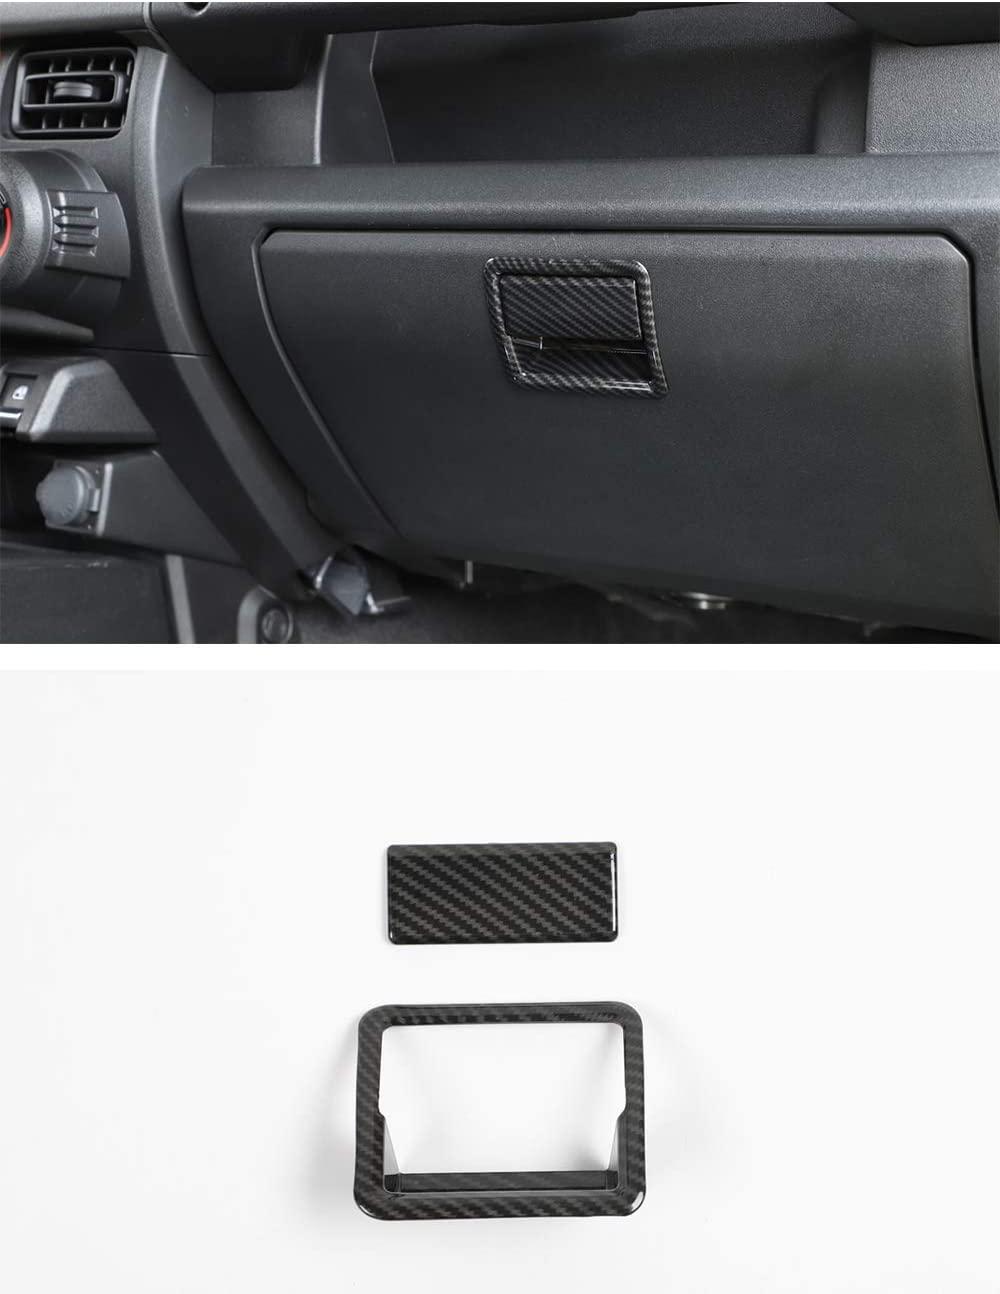 Jimny ABS Car Co-Pilot Glove Box Handle Covers, Storage Box Switch Handle Decorative Cover for Suzuki Jimny 2019-2020